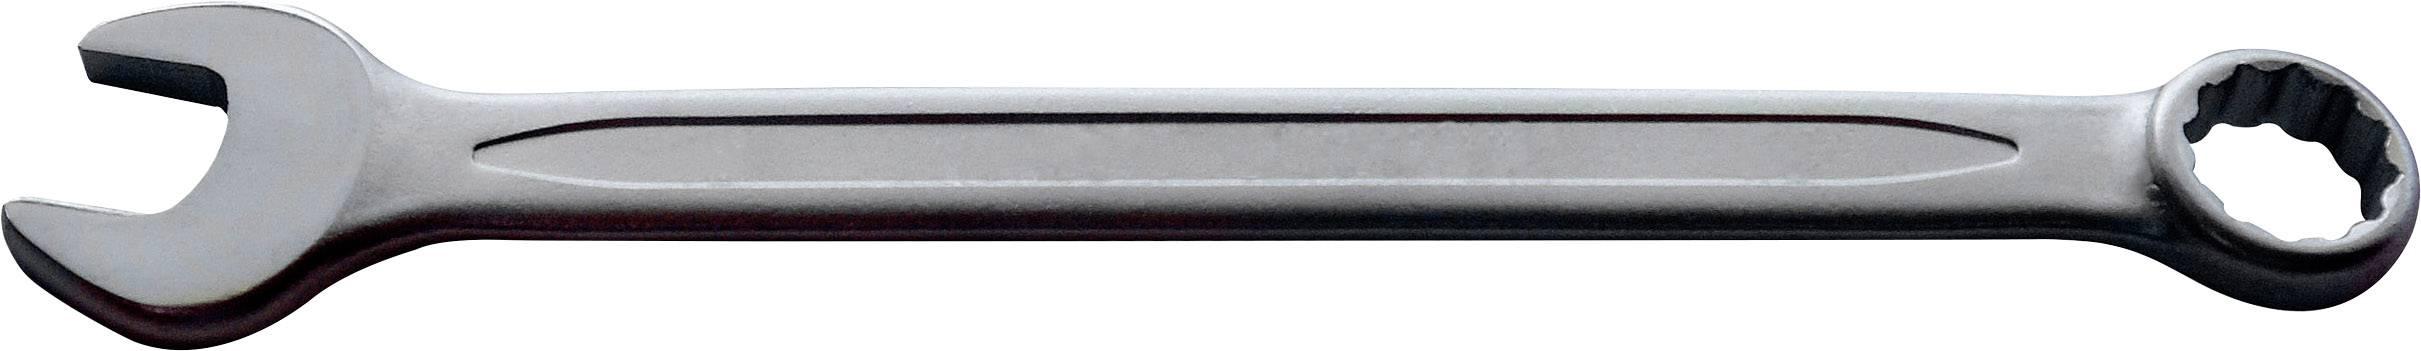 Očkoplochý kľúč/e TOOLCRAFT 820835, 11 mm